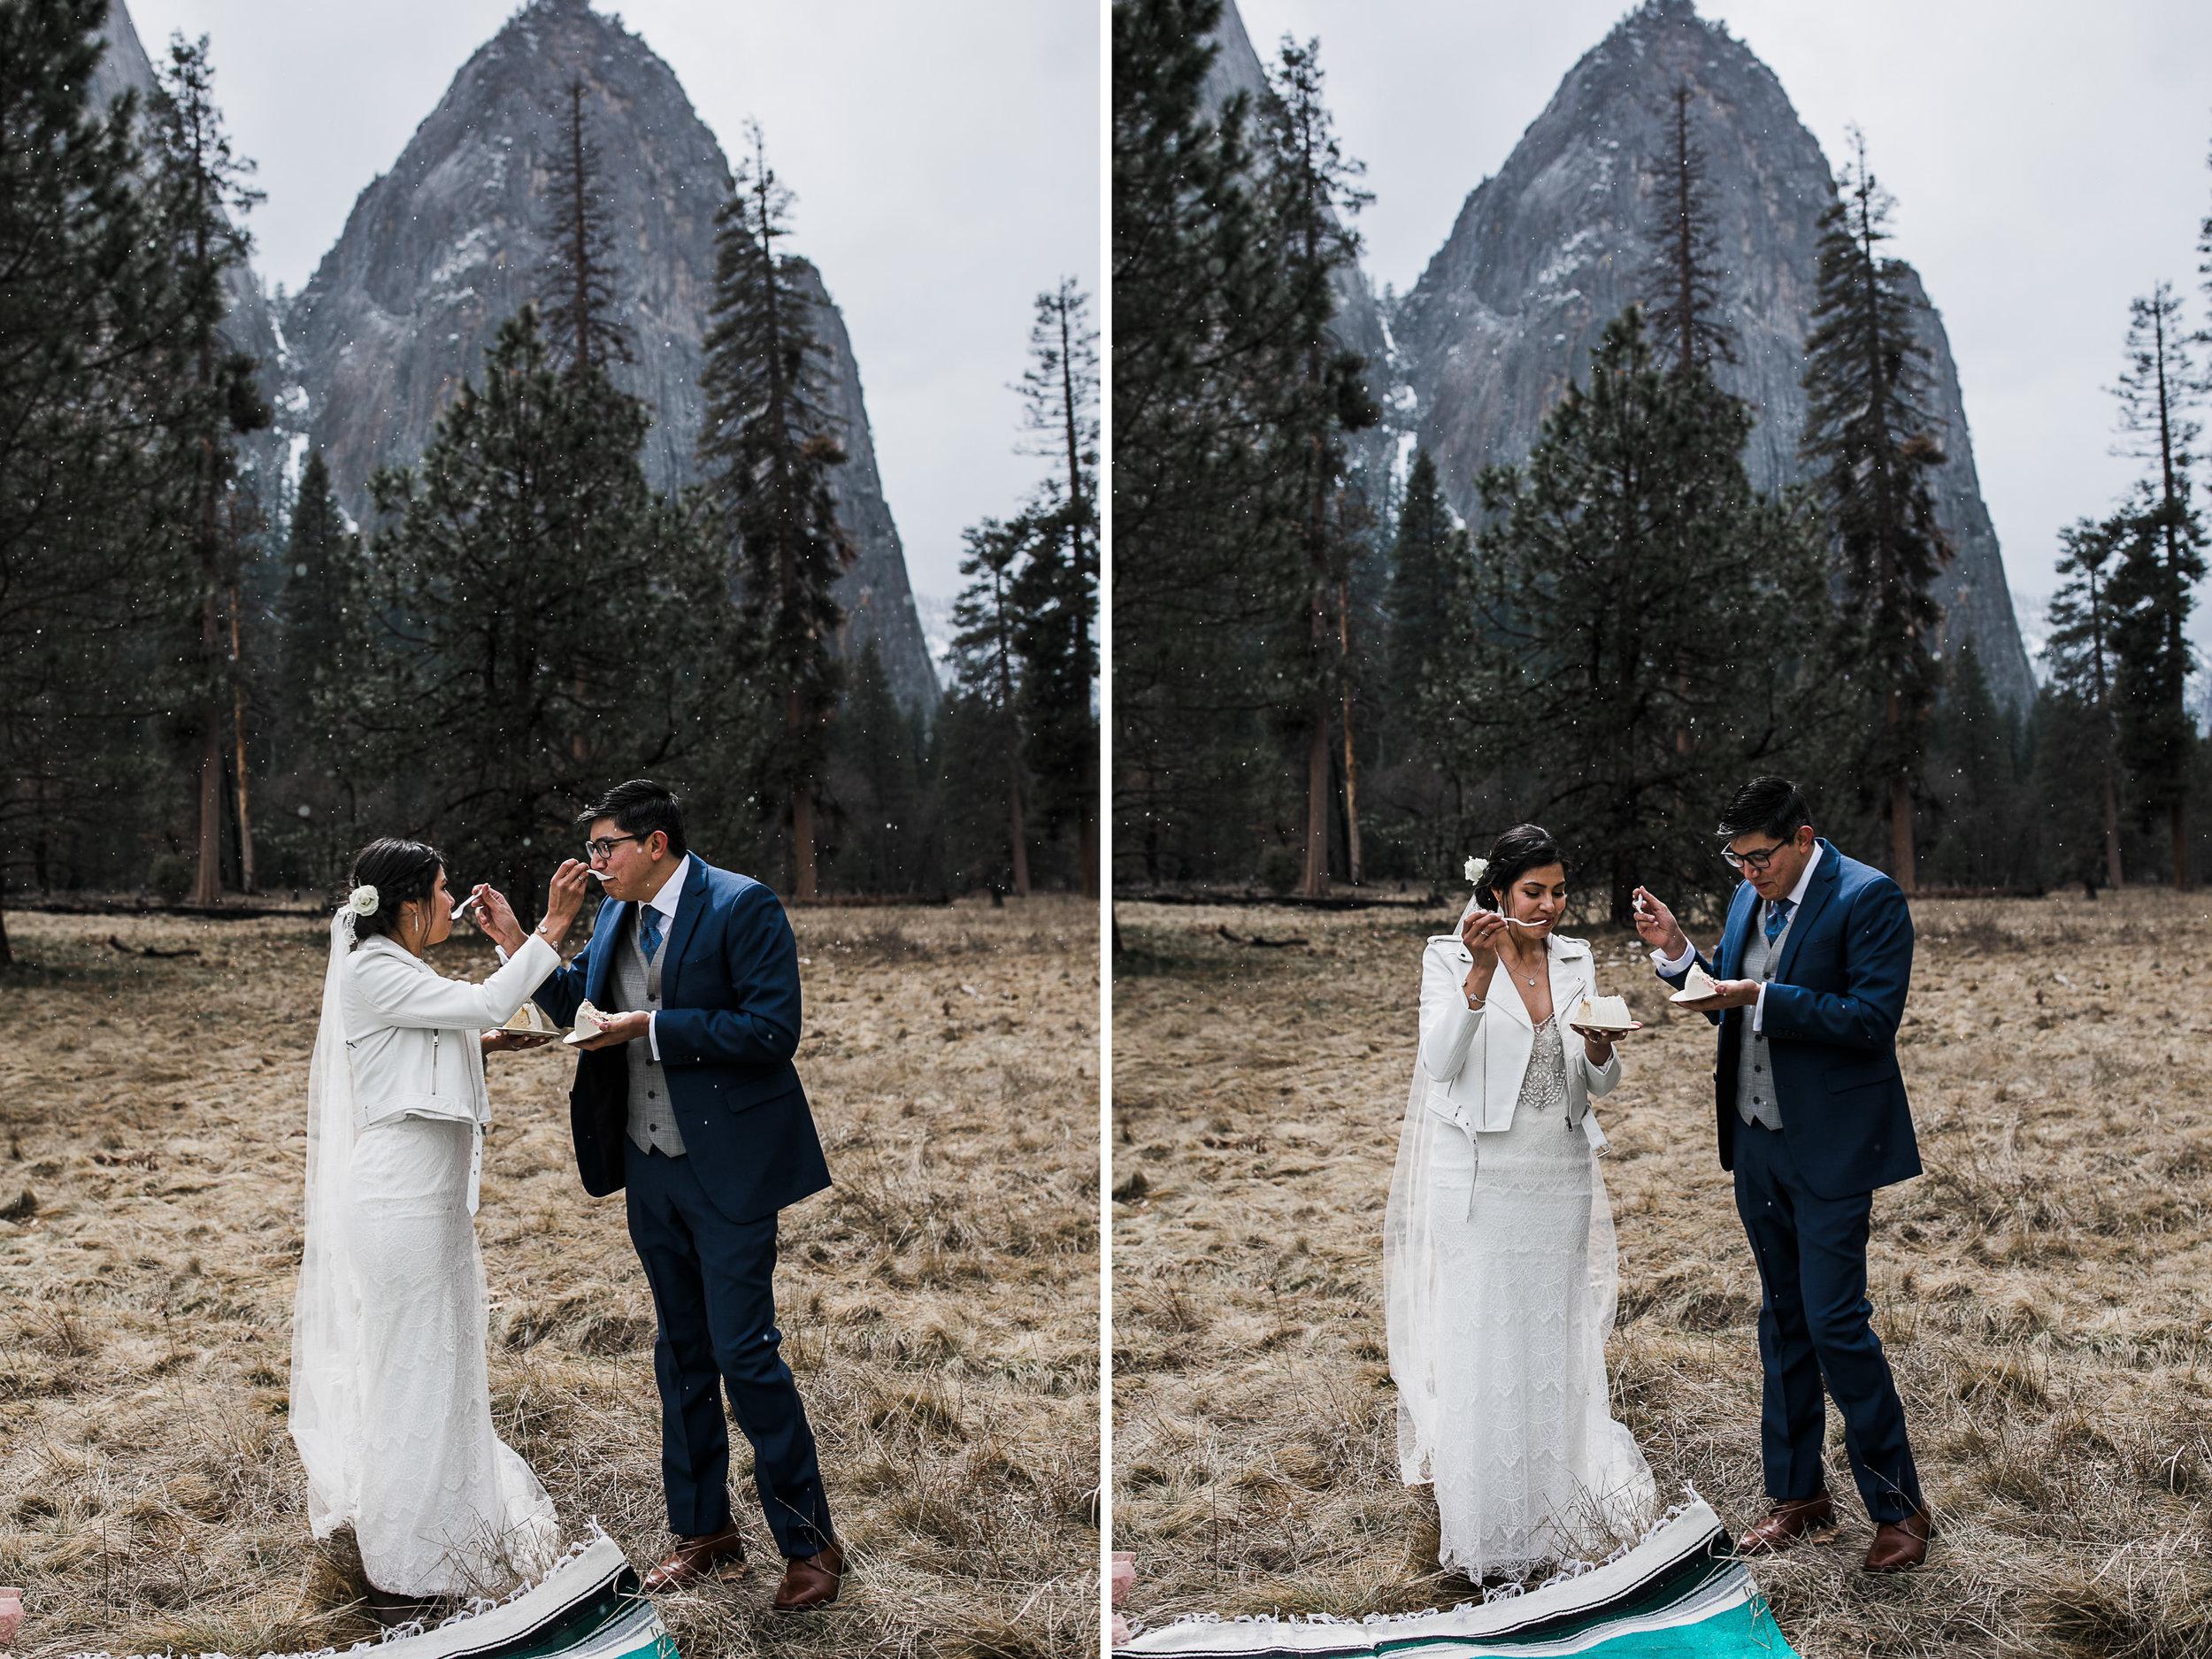 mini wedding cake for an elopement in yosemite